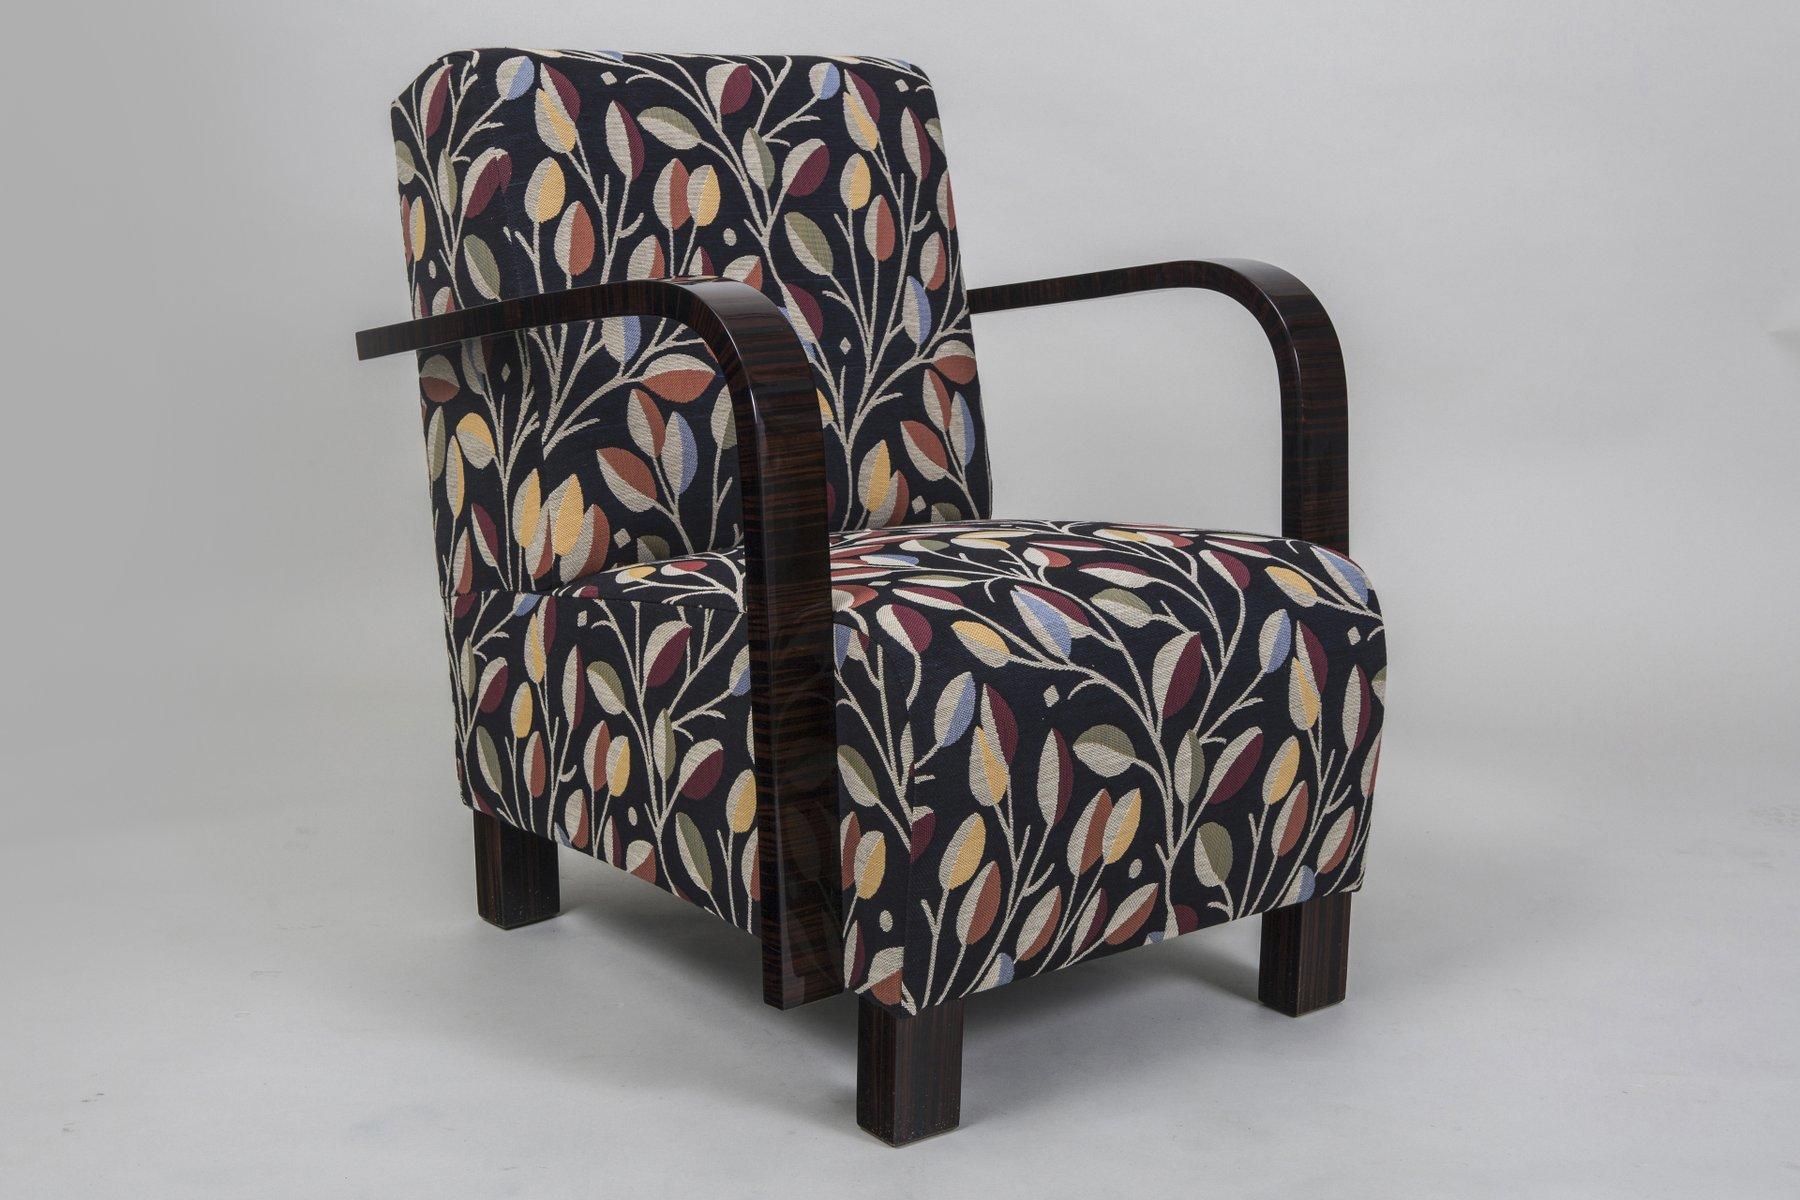 bunter vintage sessel bei pamono kaufen. Black Bedroom Furniture Sets. Home Design Ideas